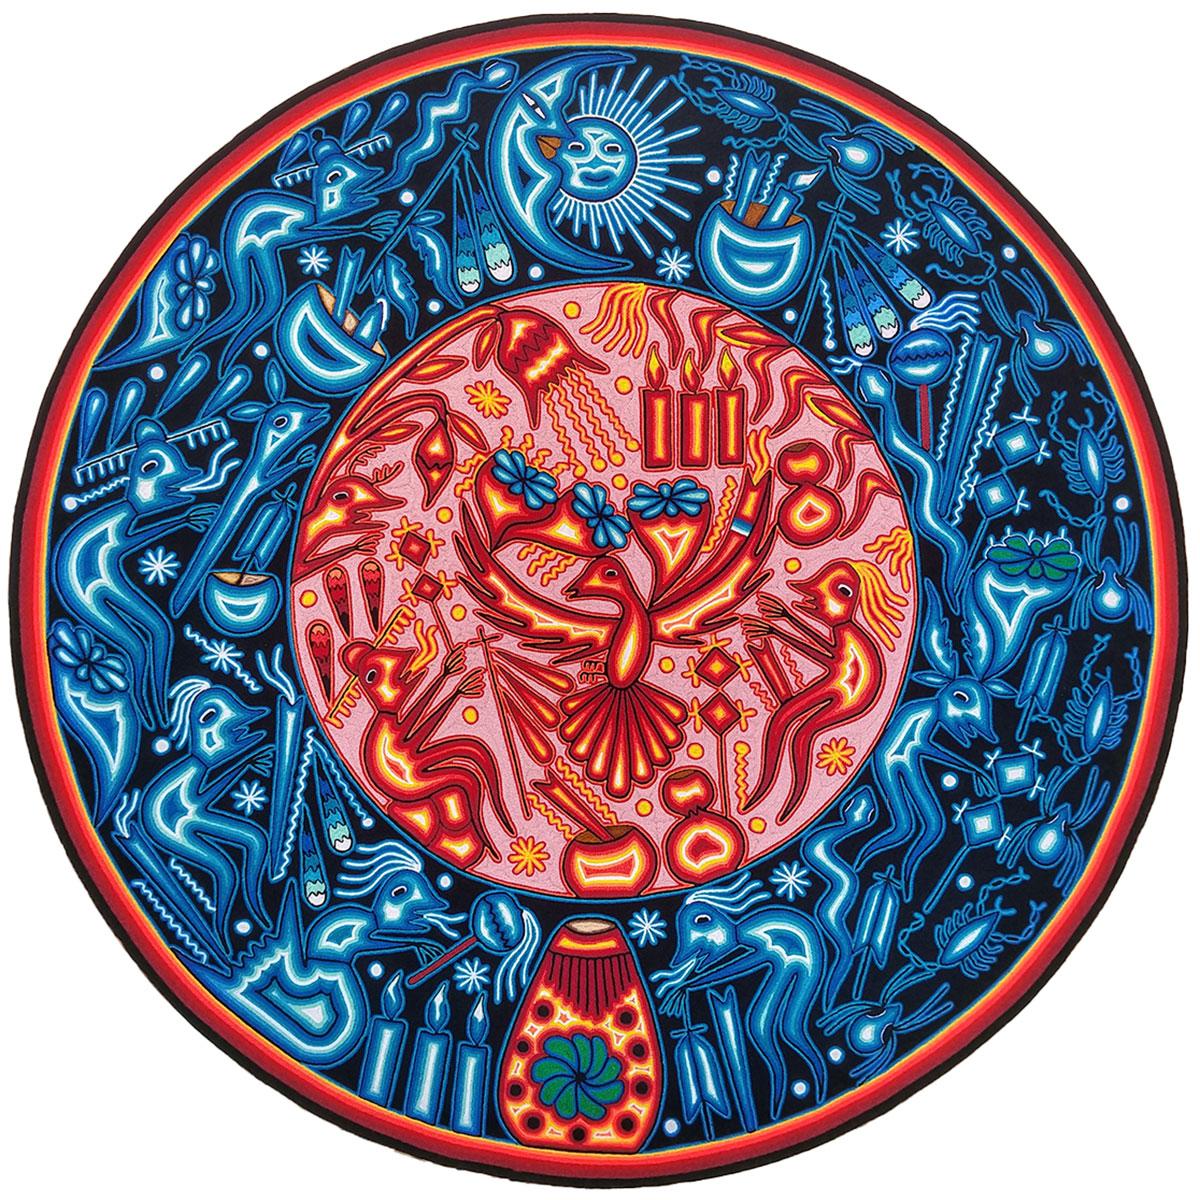 Wixárika (Huichol) Art Heliceo de la Cruz Benitez: 39″ Premier Round Huichol Yarn Painting Direct from Mexico Huichol